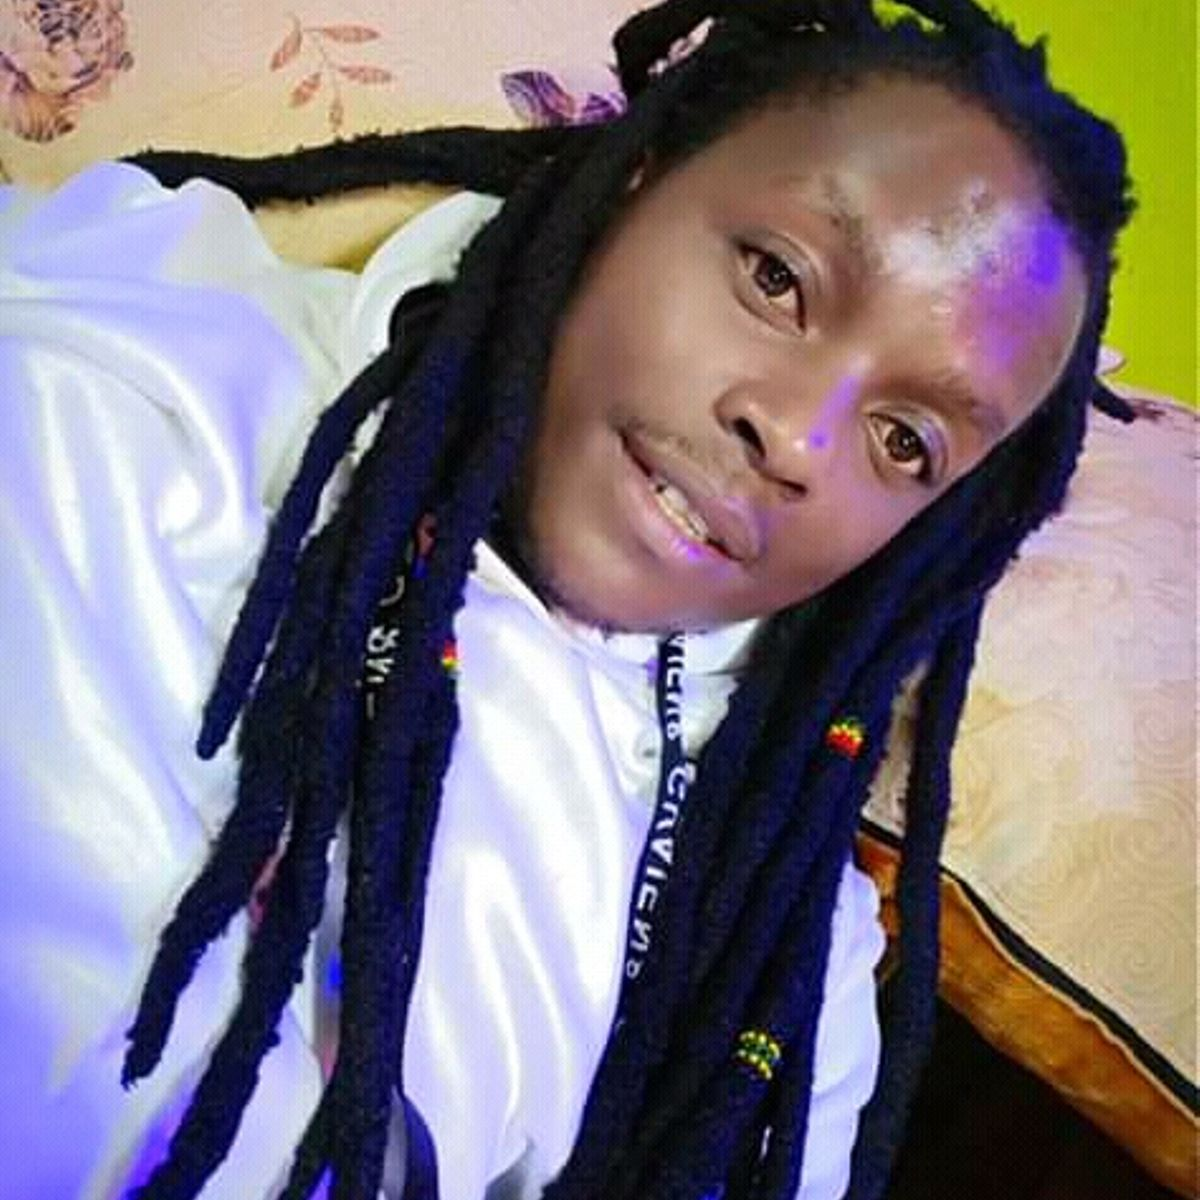 Things you didn't know about Kamba Benga star Kithungo Raha